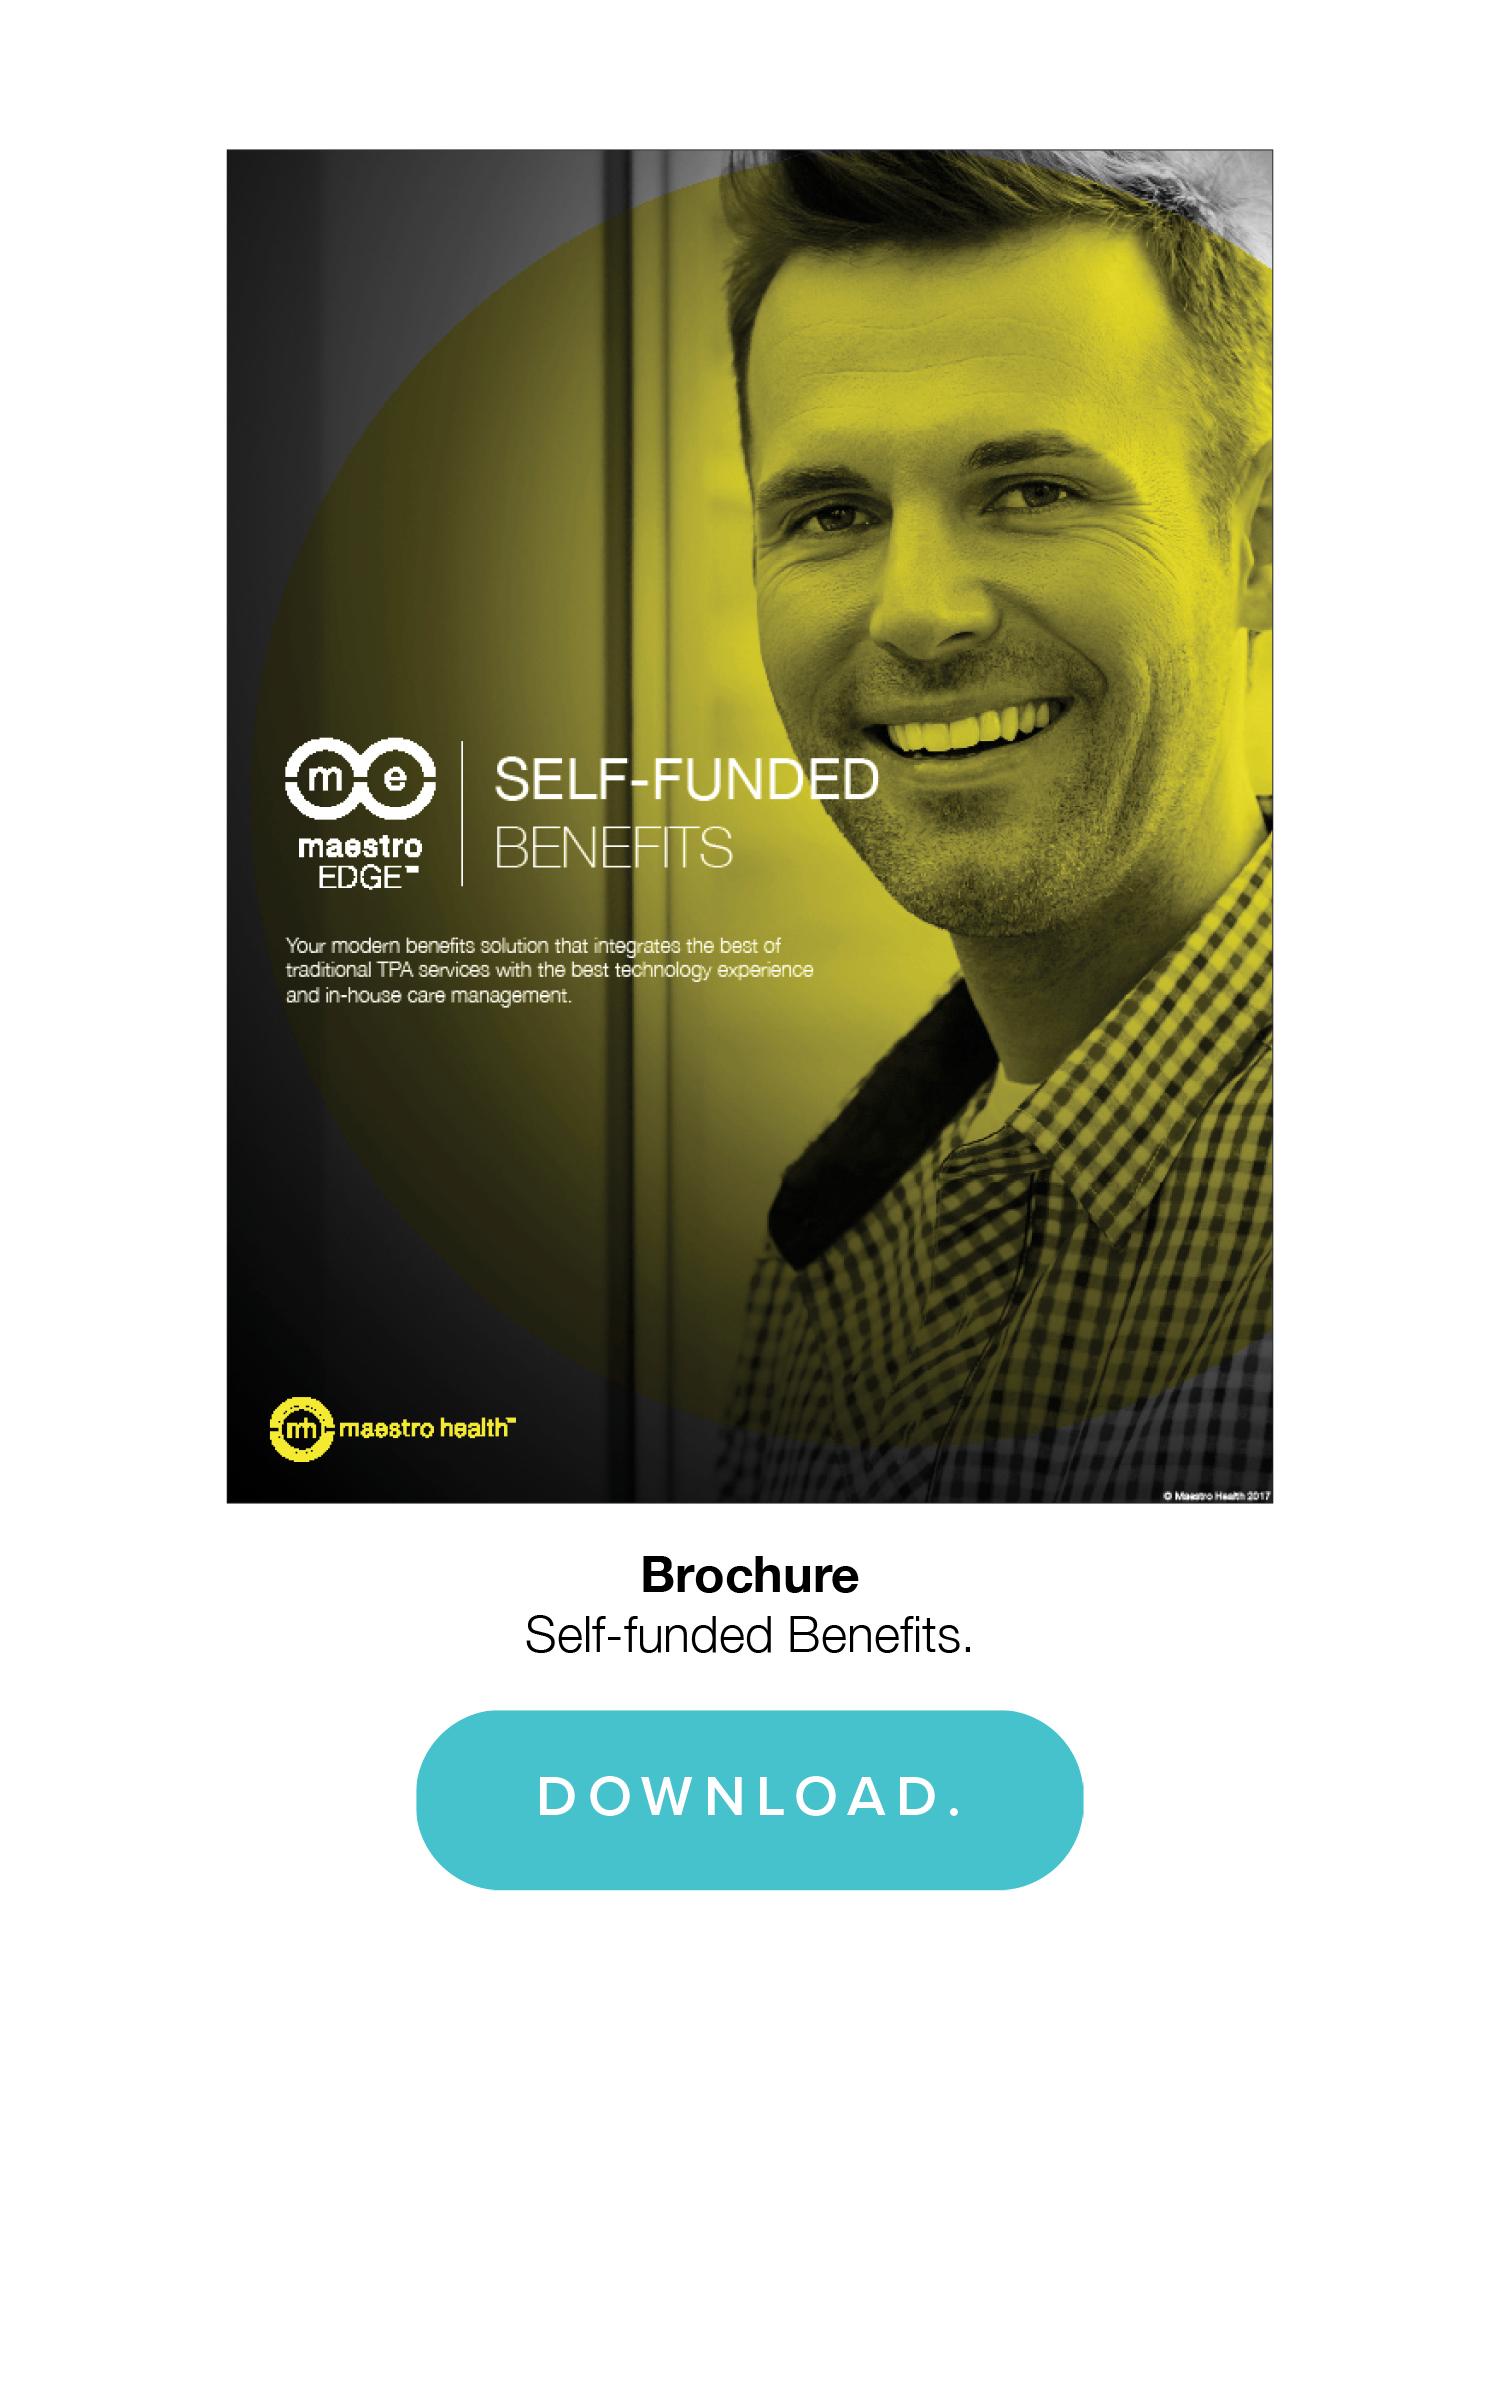 Self-Funded Benefits Brochure